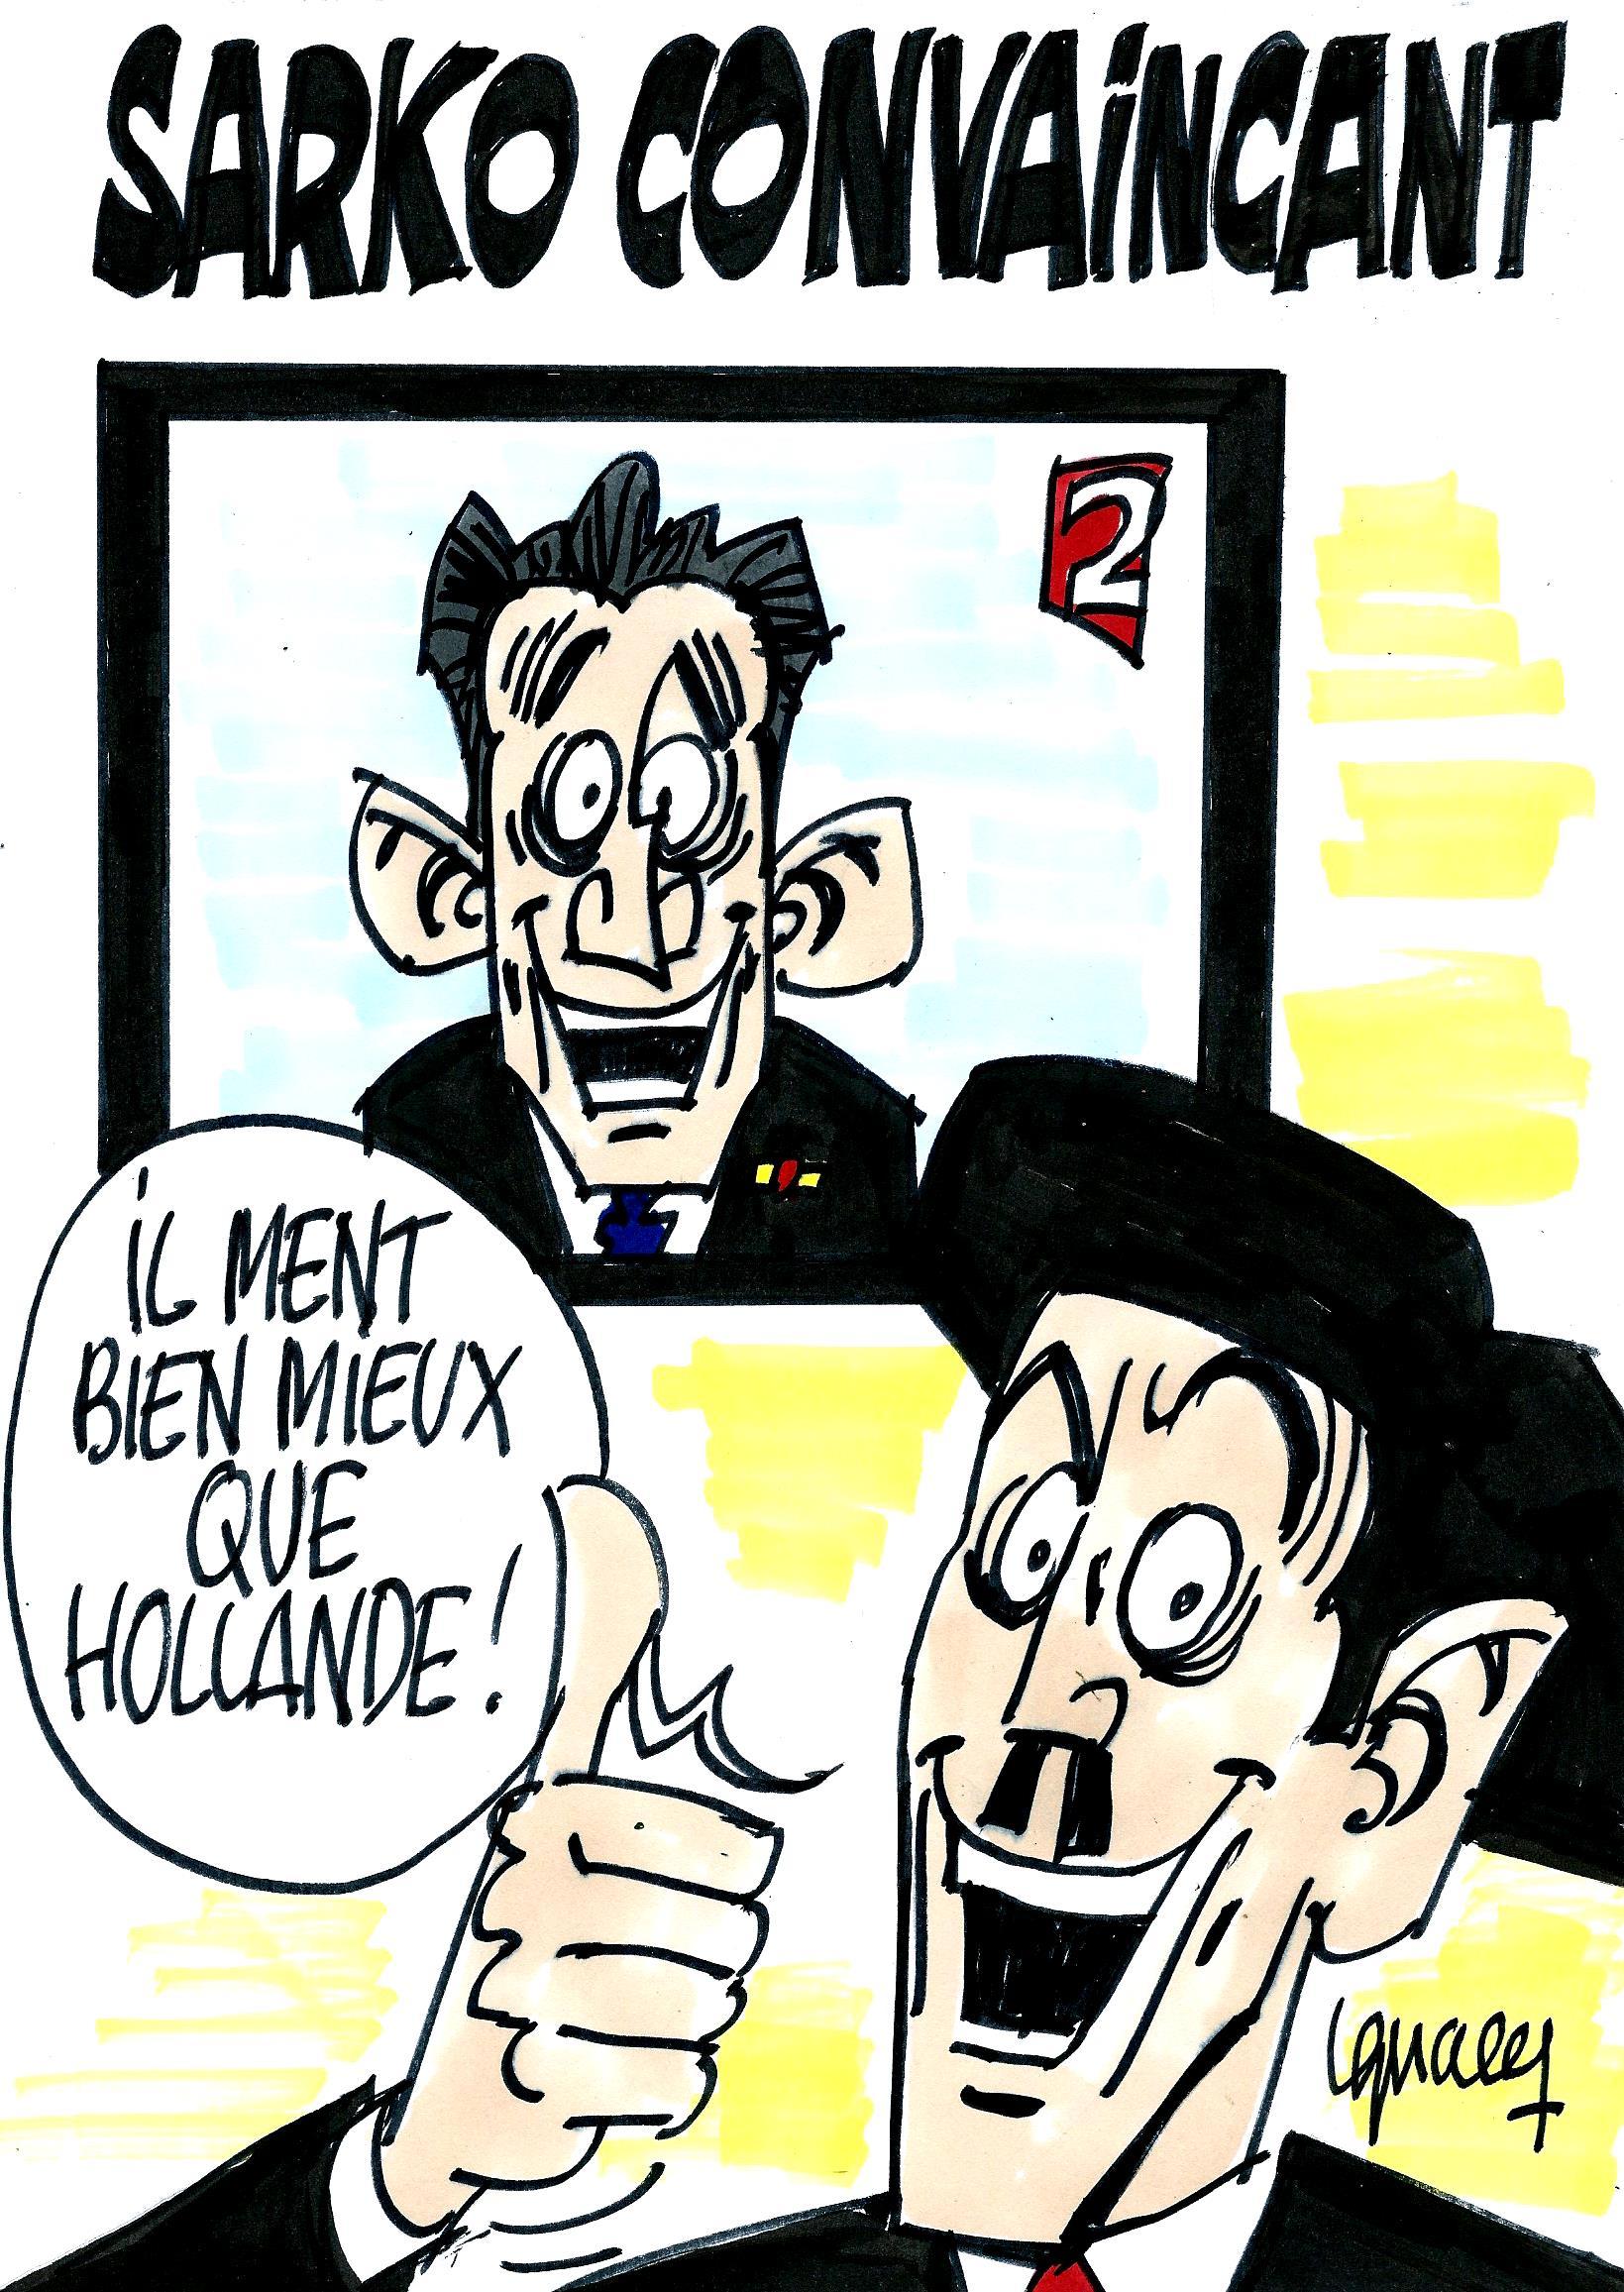 Ignace - Sarko convaincant